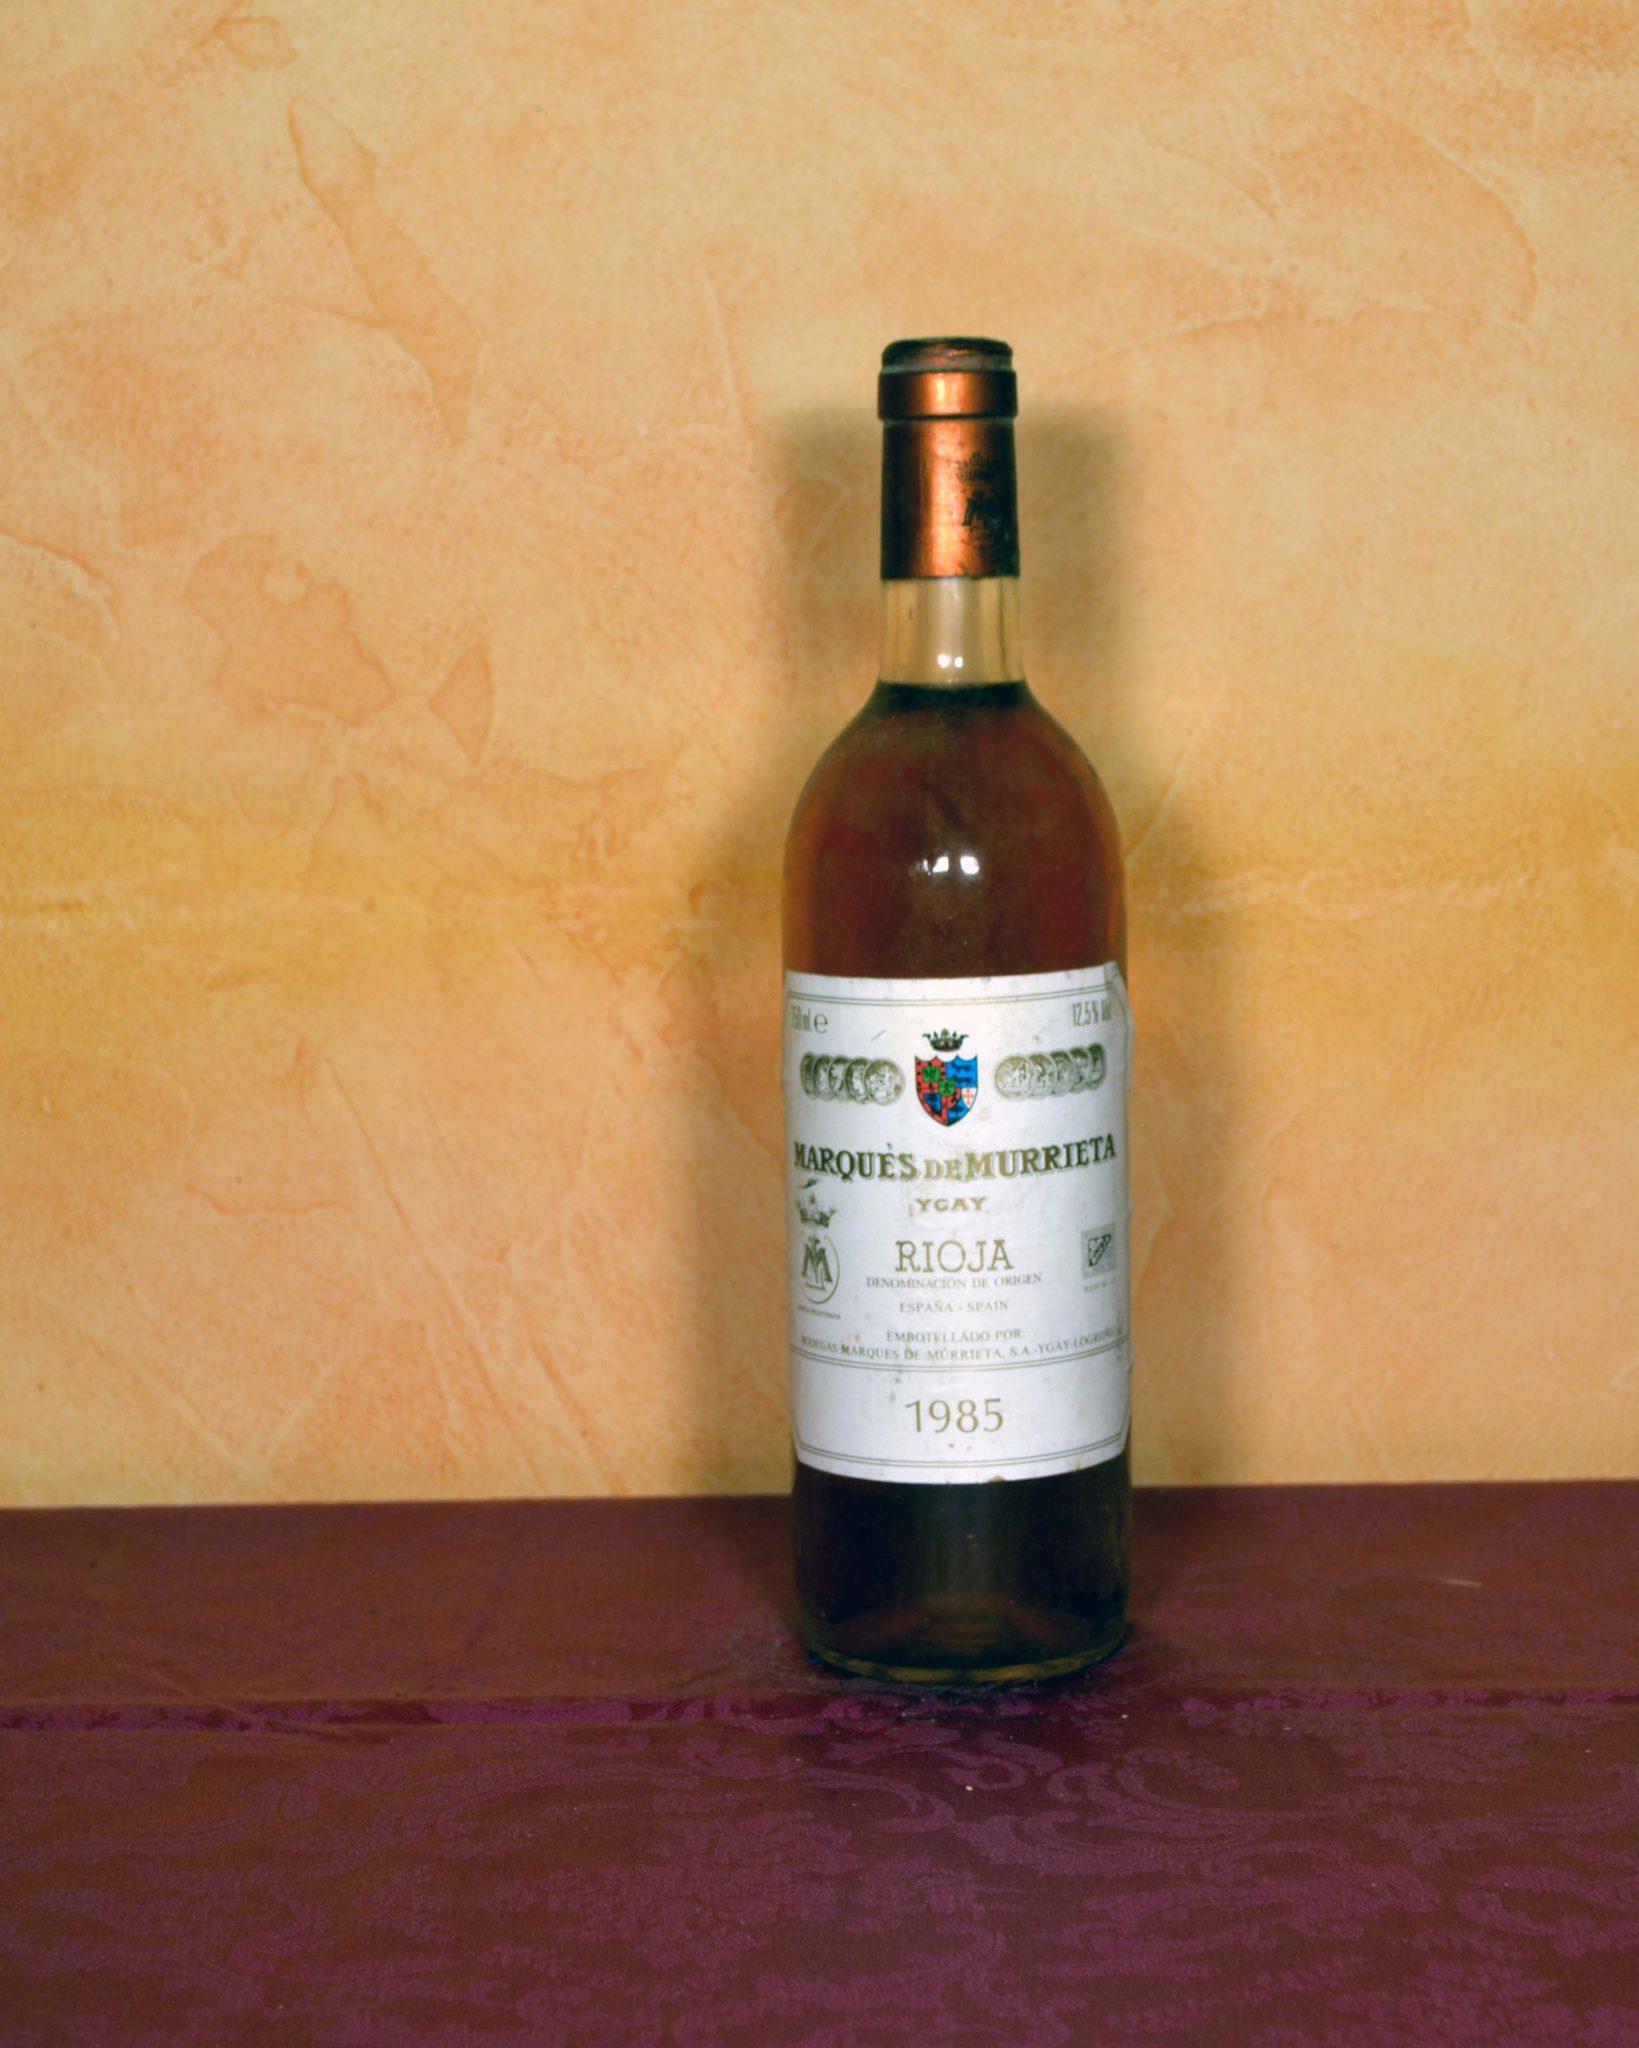 Marques de Murrieta blanco 1985